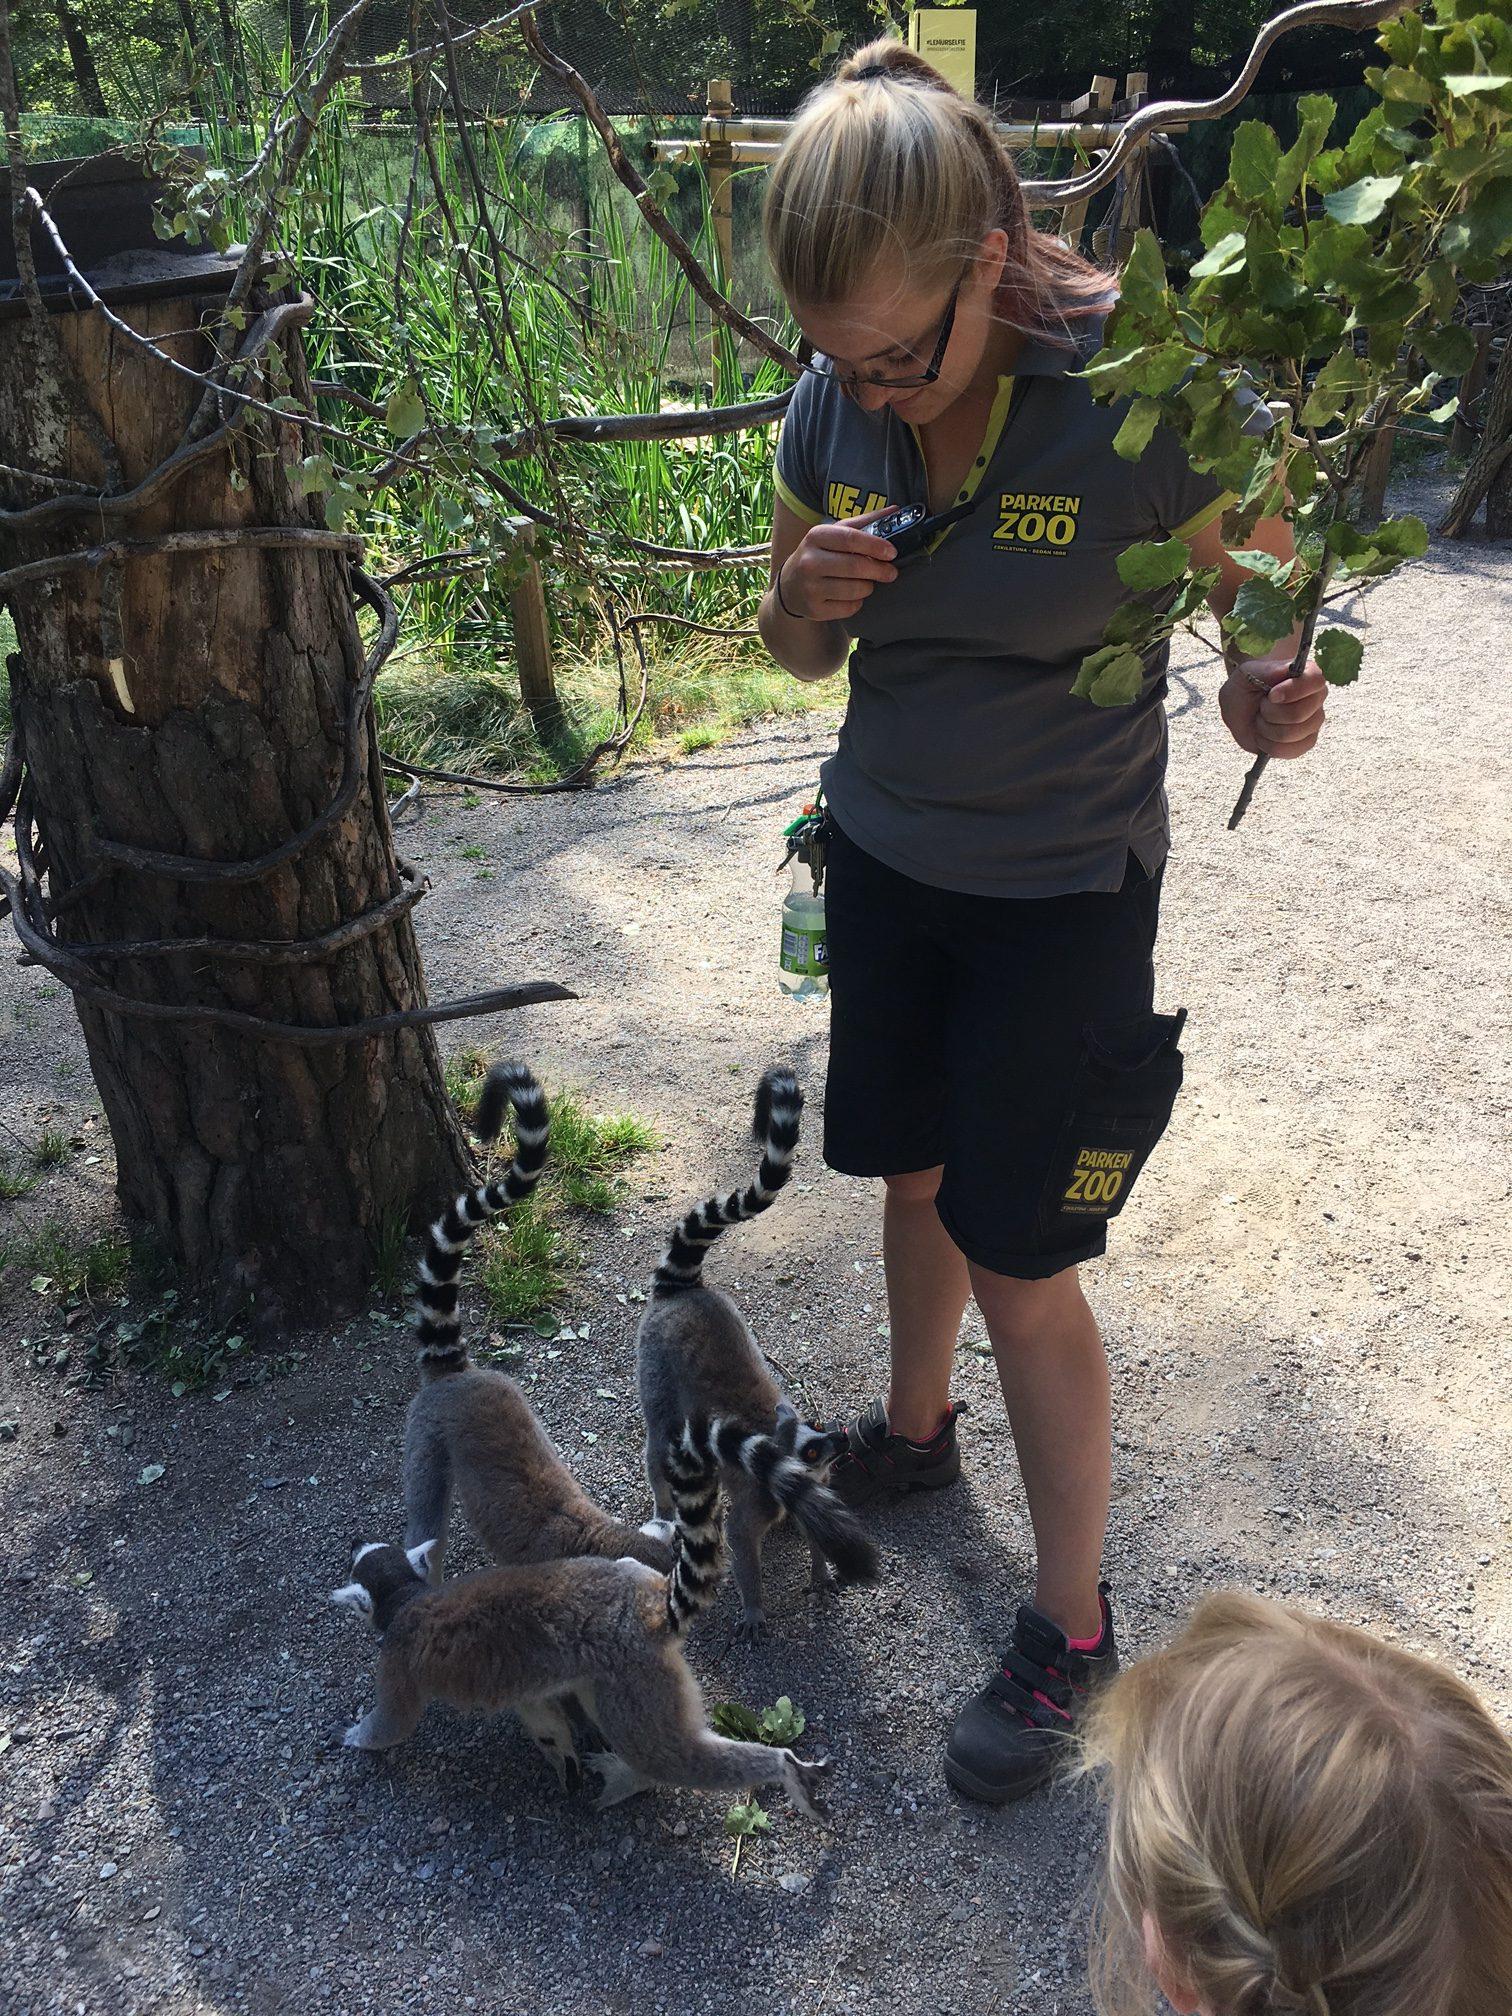 Parken-zoo-lemurer